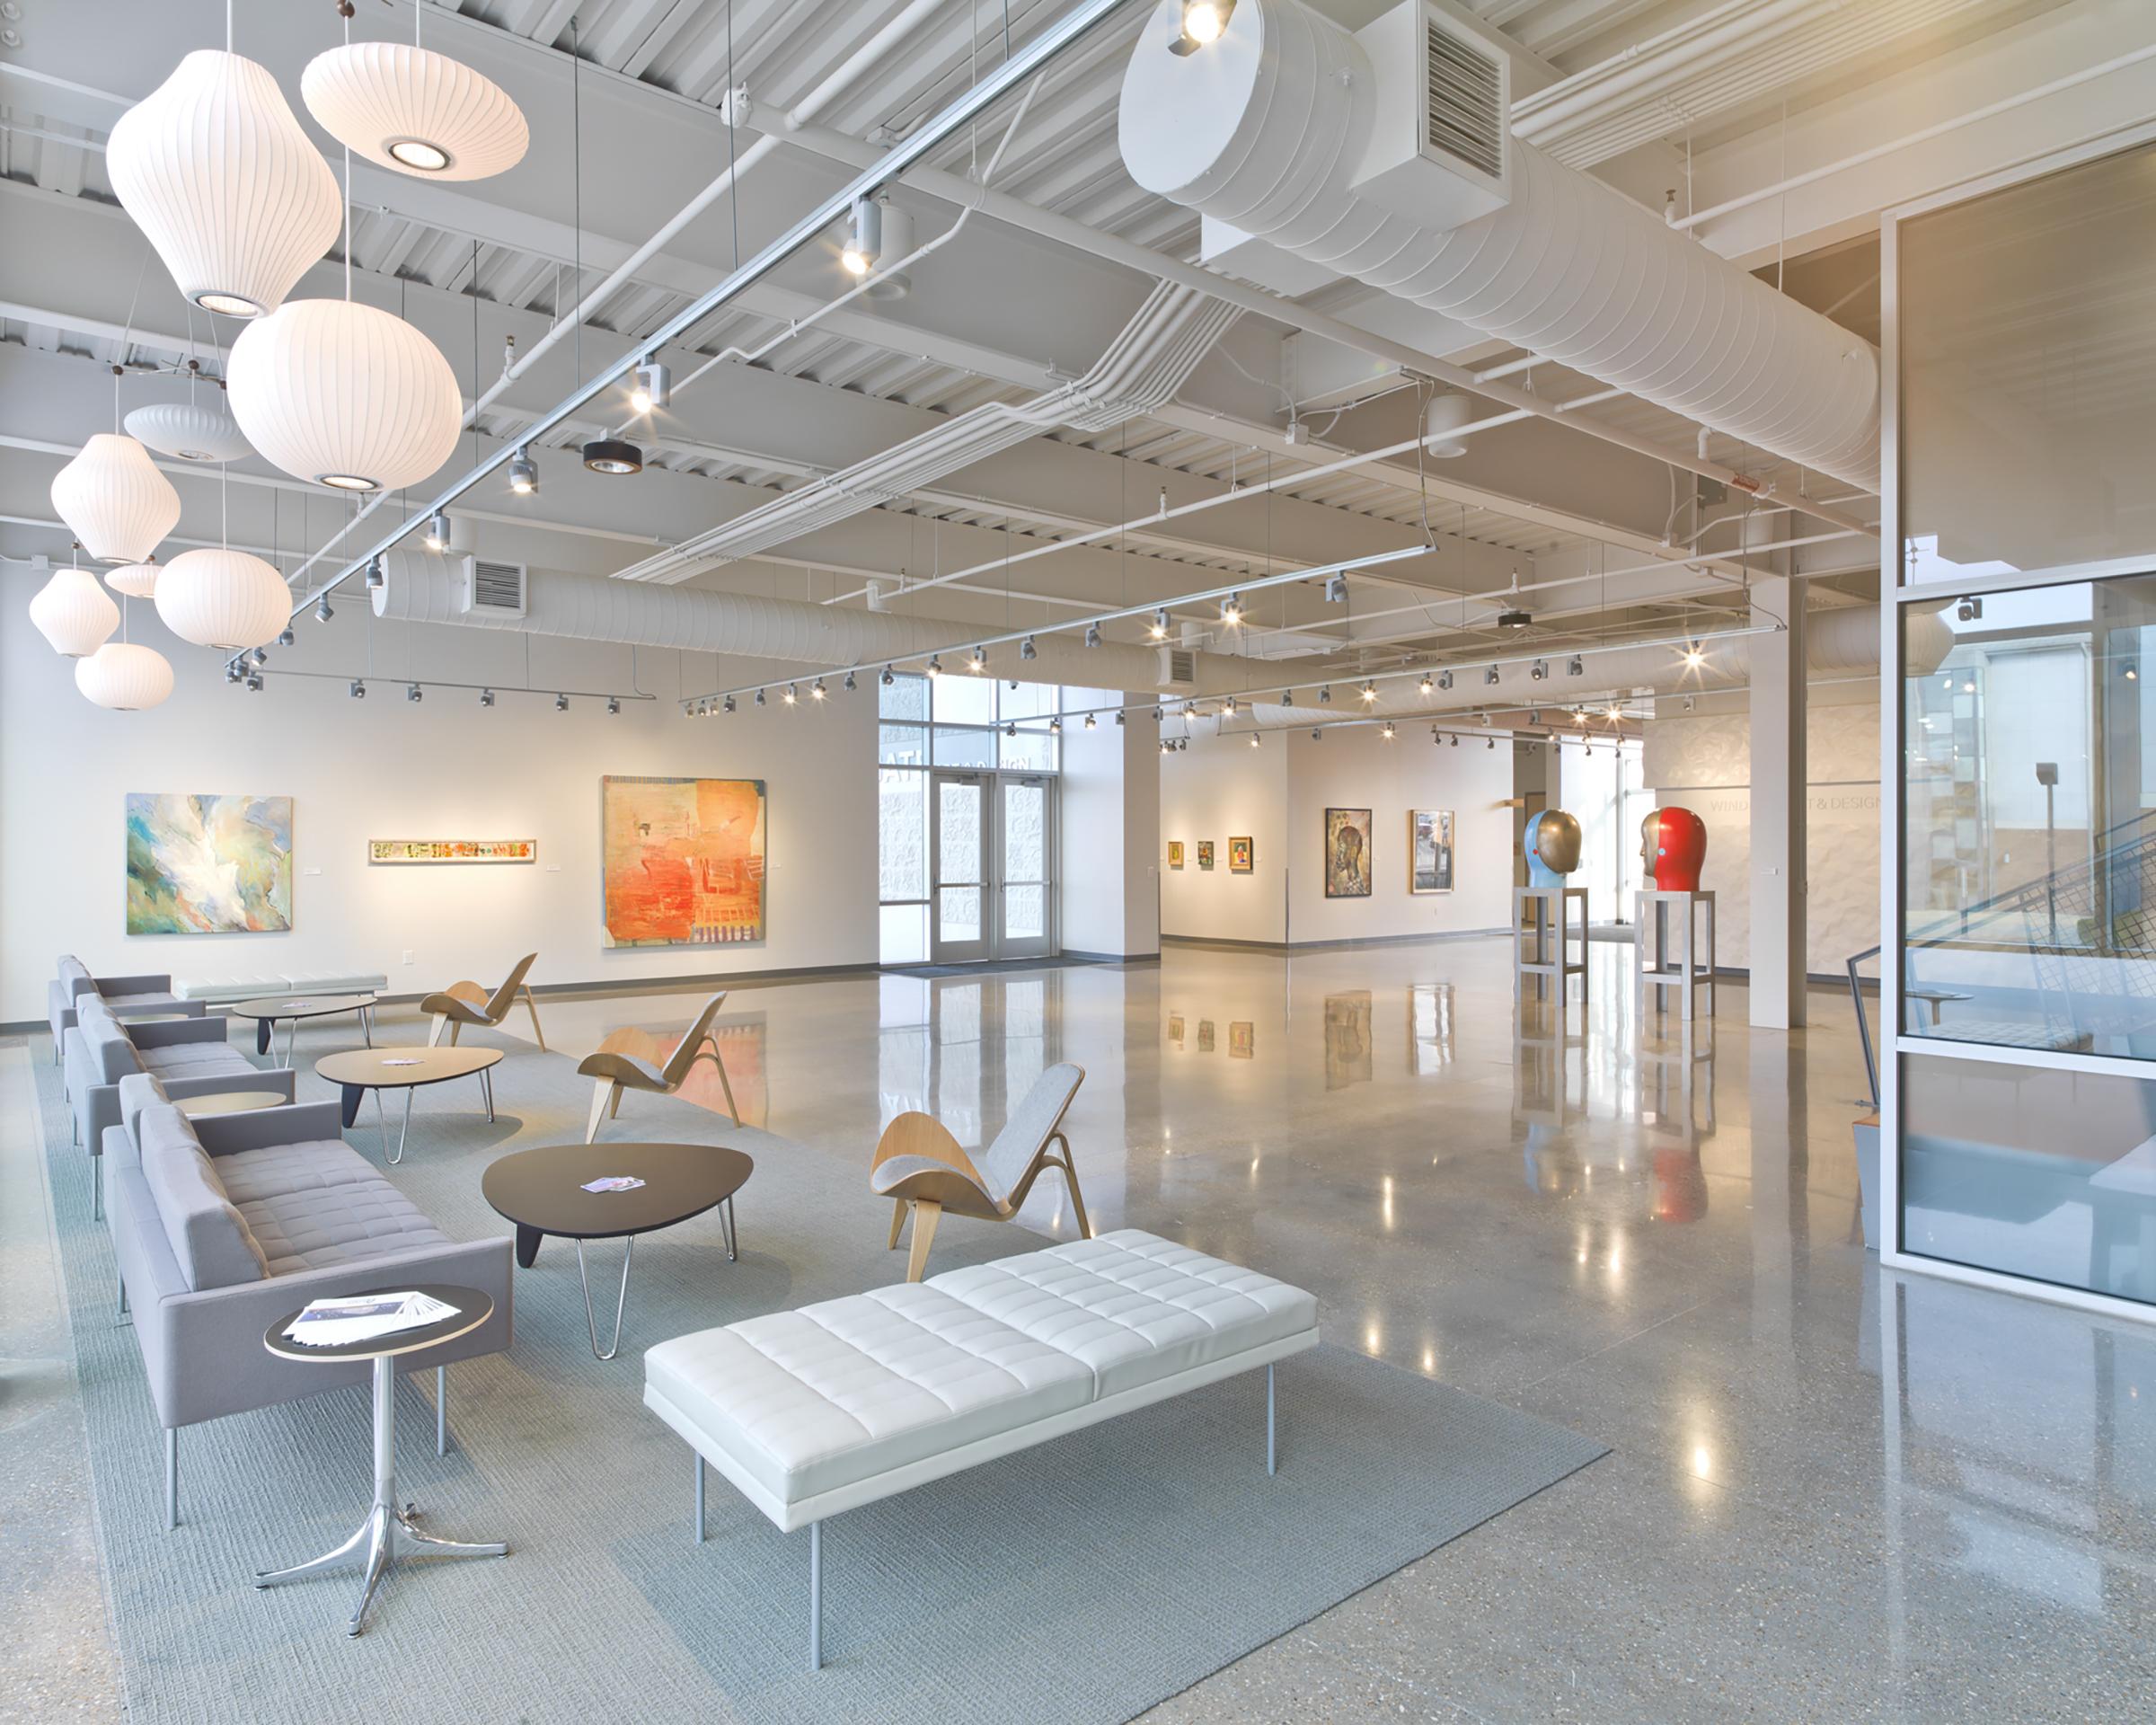 Lobby at UAFS Windgate Art & Design